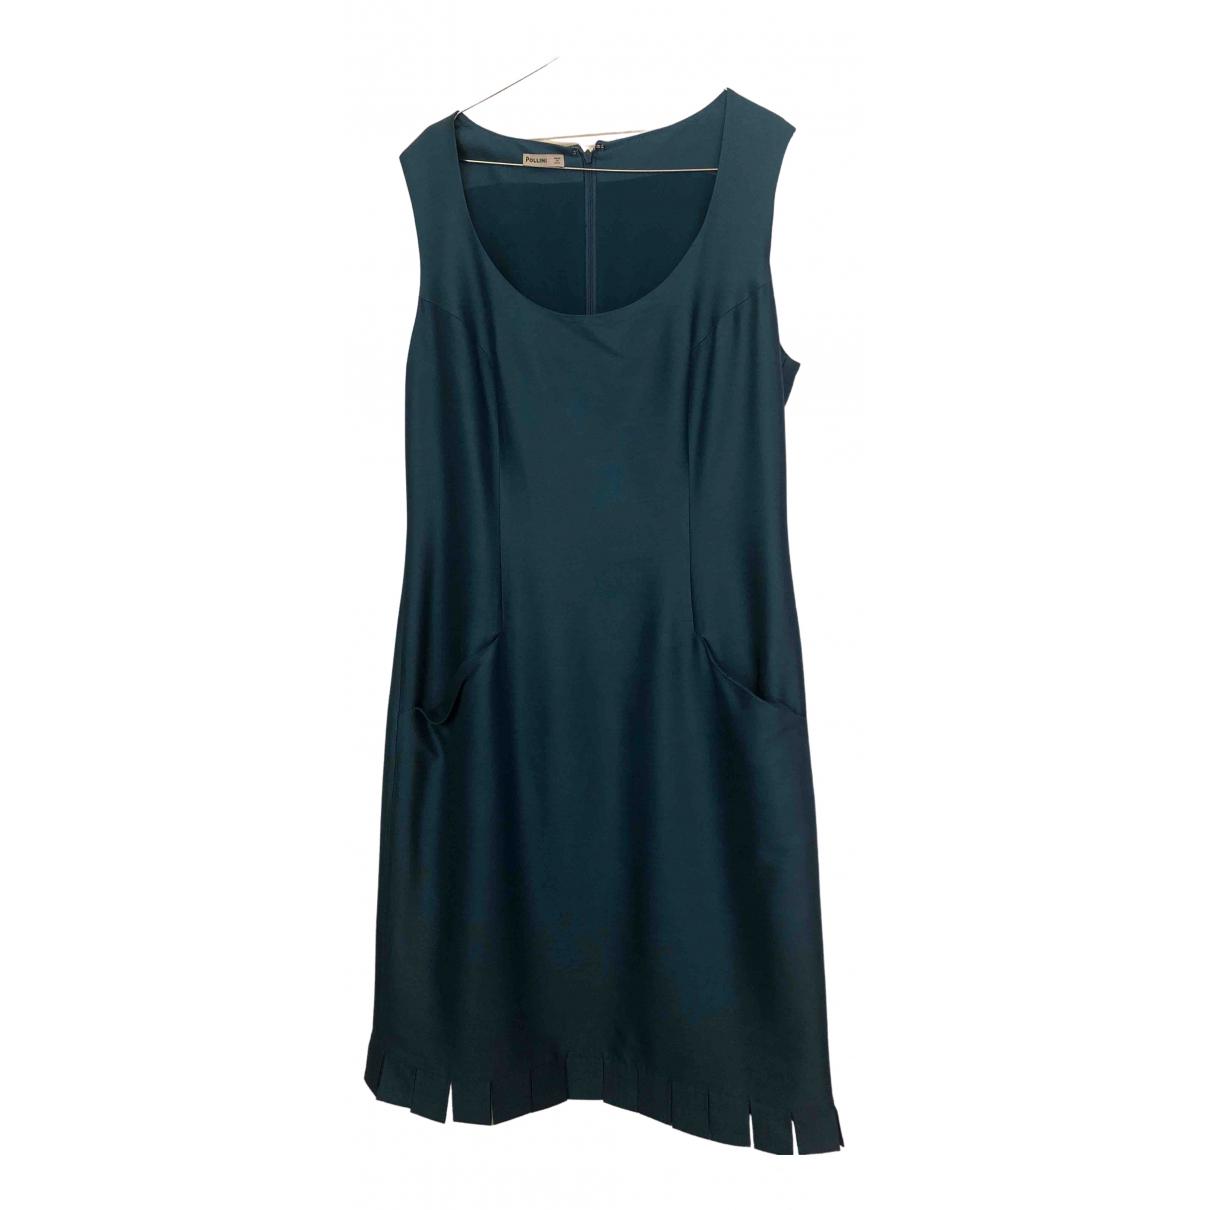 Pollini \N Turquoise Silk dress for Women 44 IT